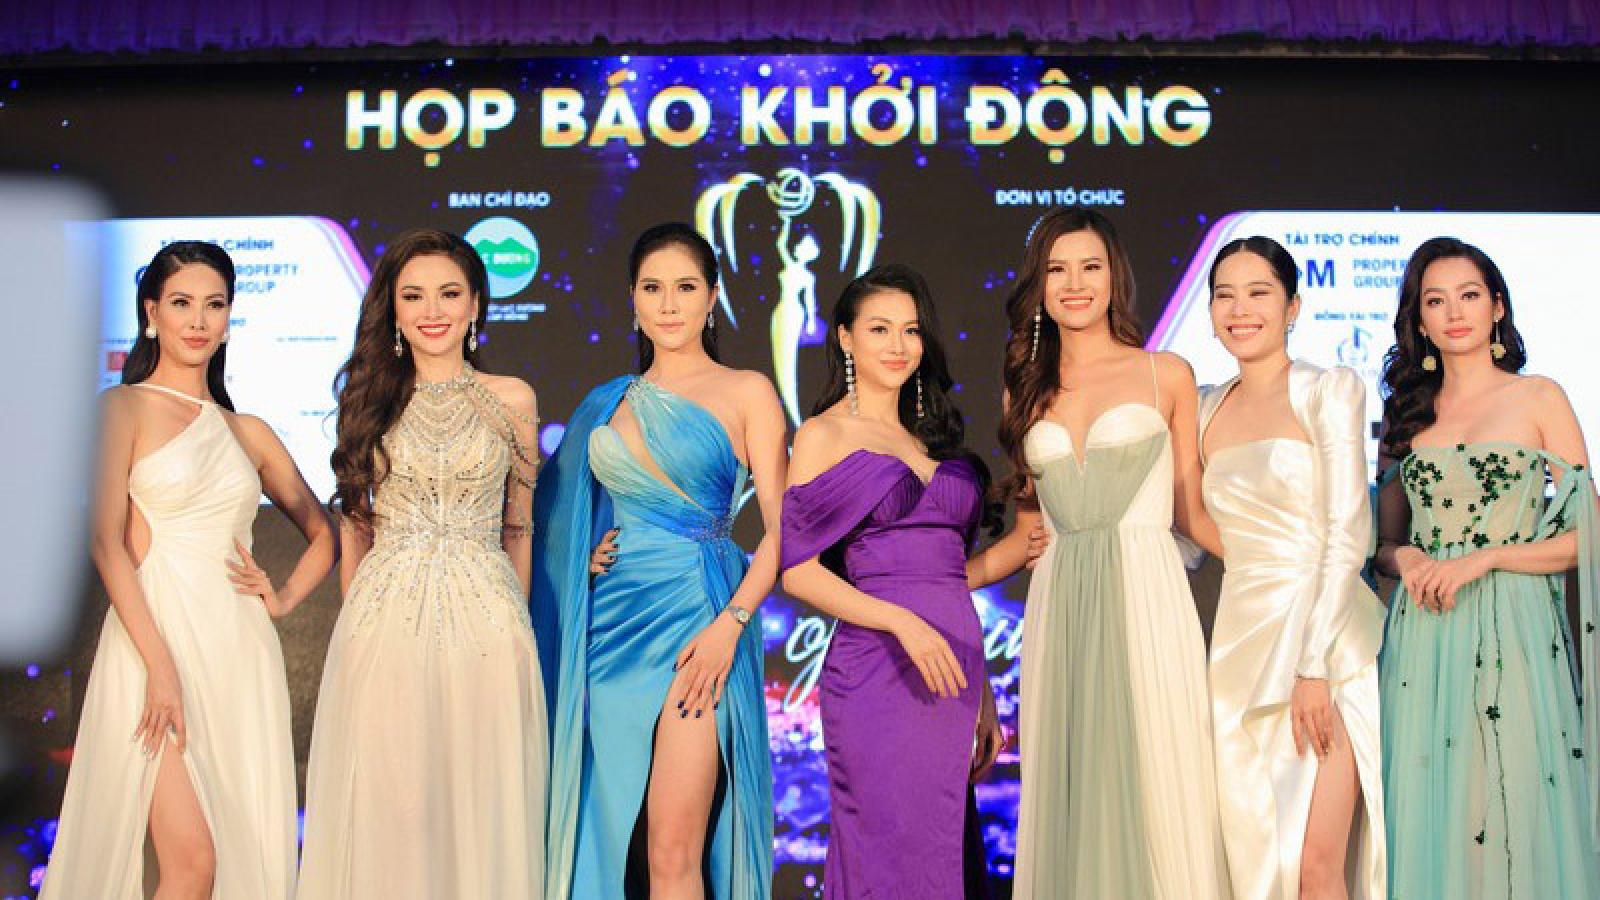 Miss Earth Vietnam 2021 postponed due to COVID-19 threats